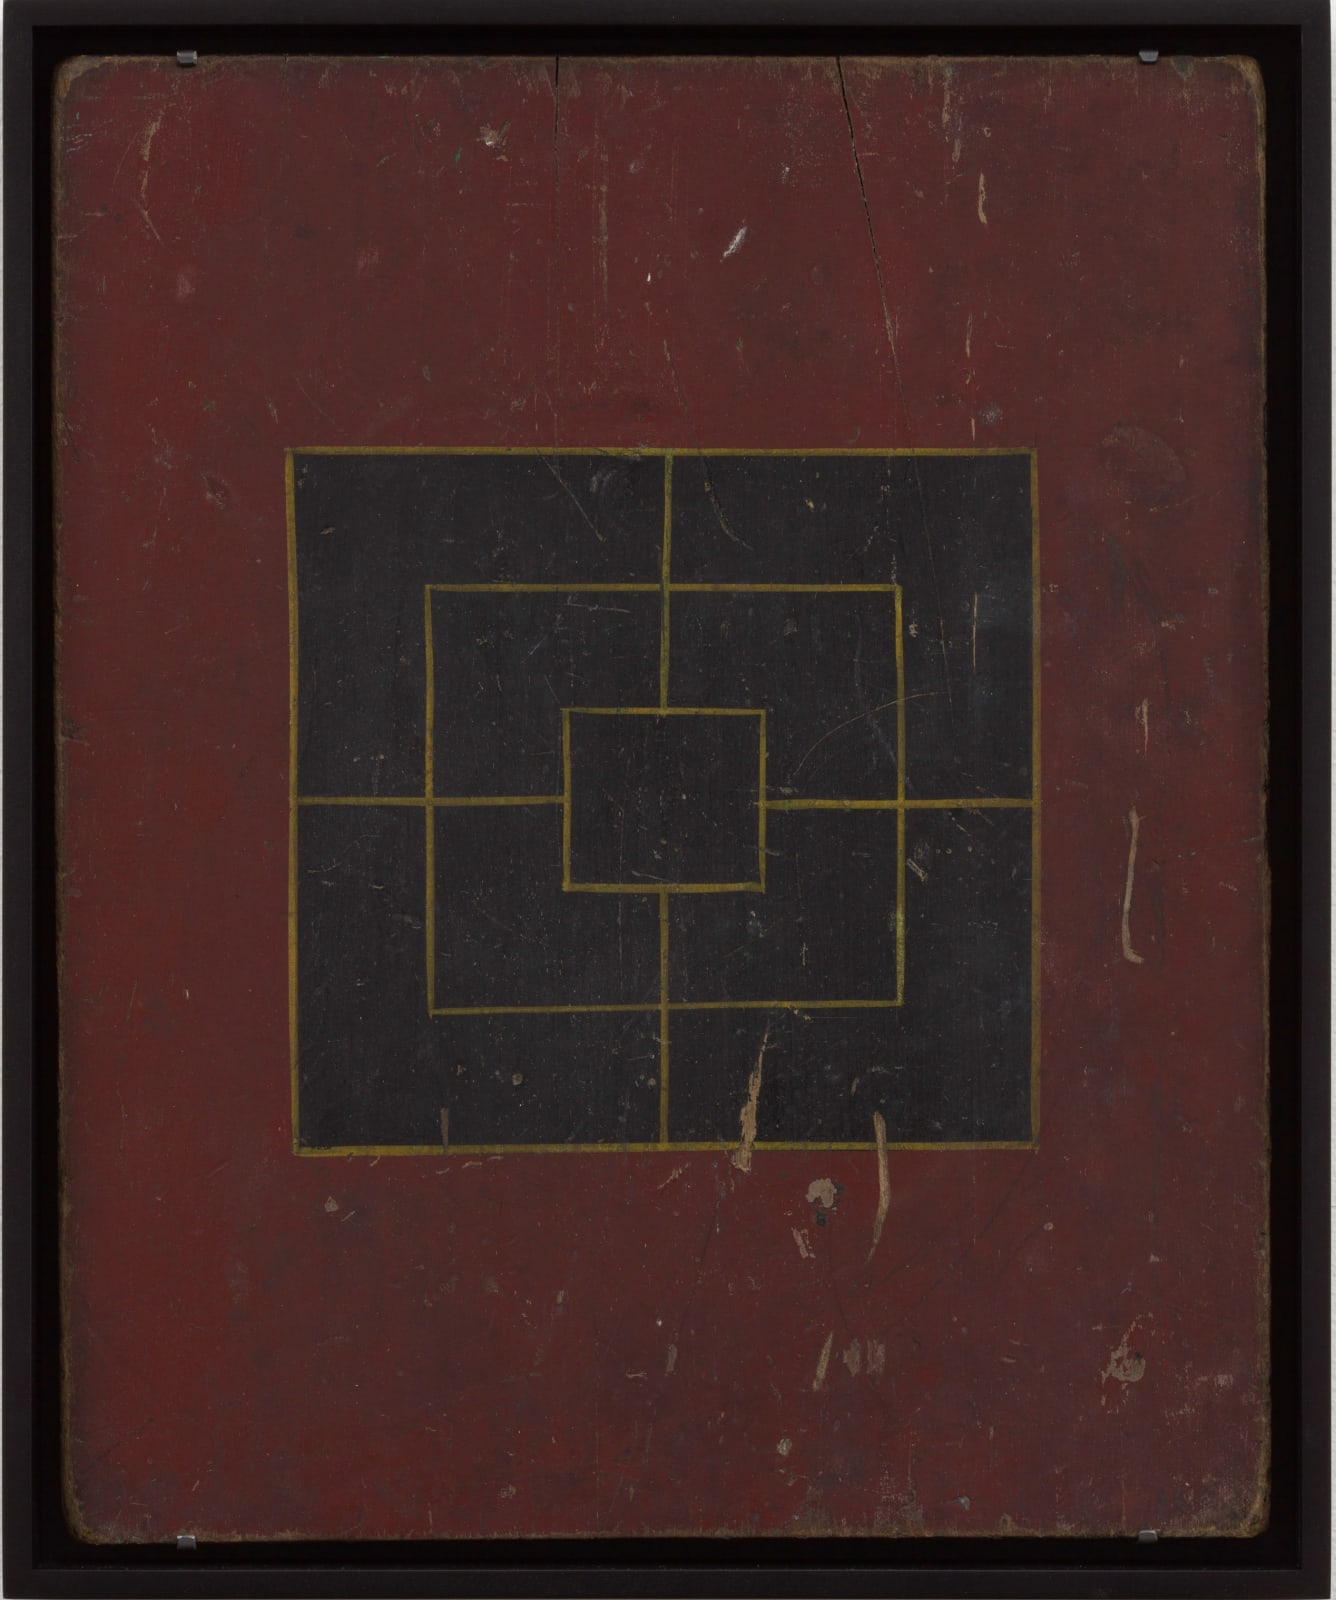 MILLS GAME BOARD 19 x 15 1/2 in. 48.3 x 39.4 cm. (AU 296)